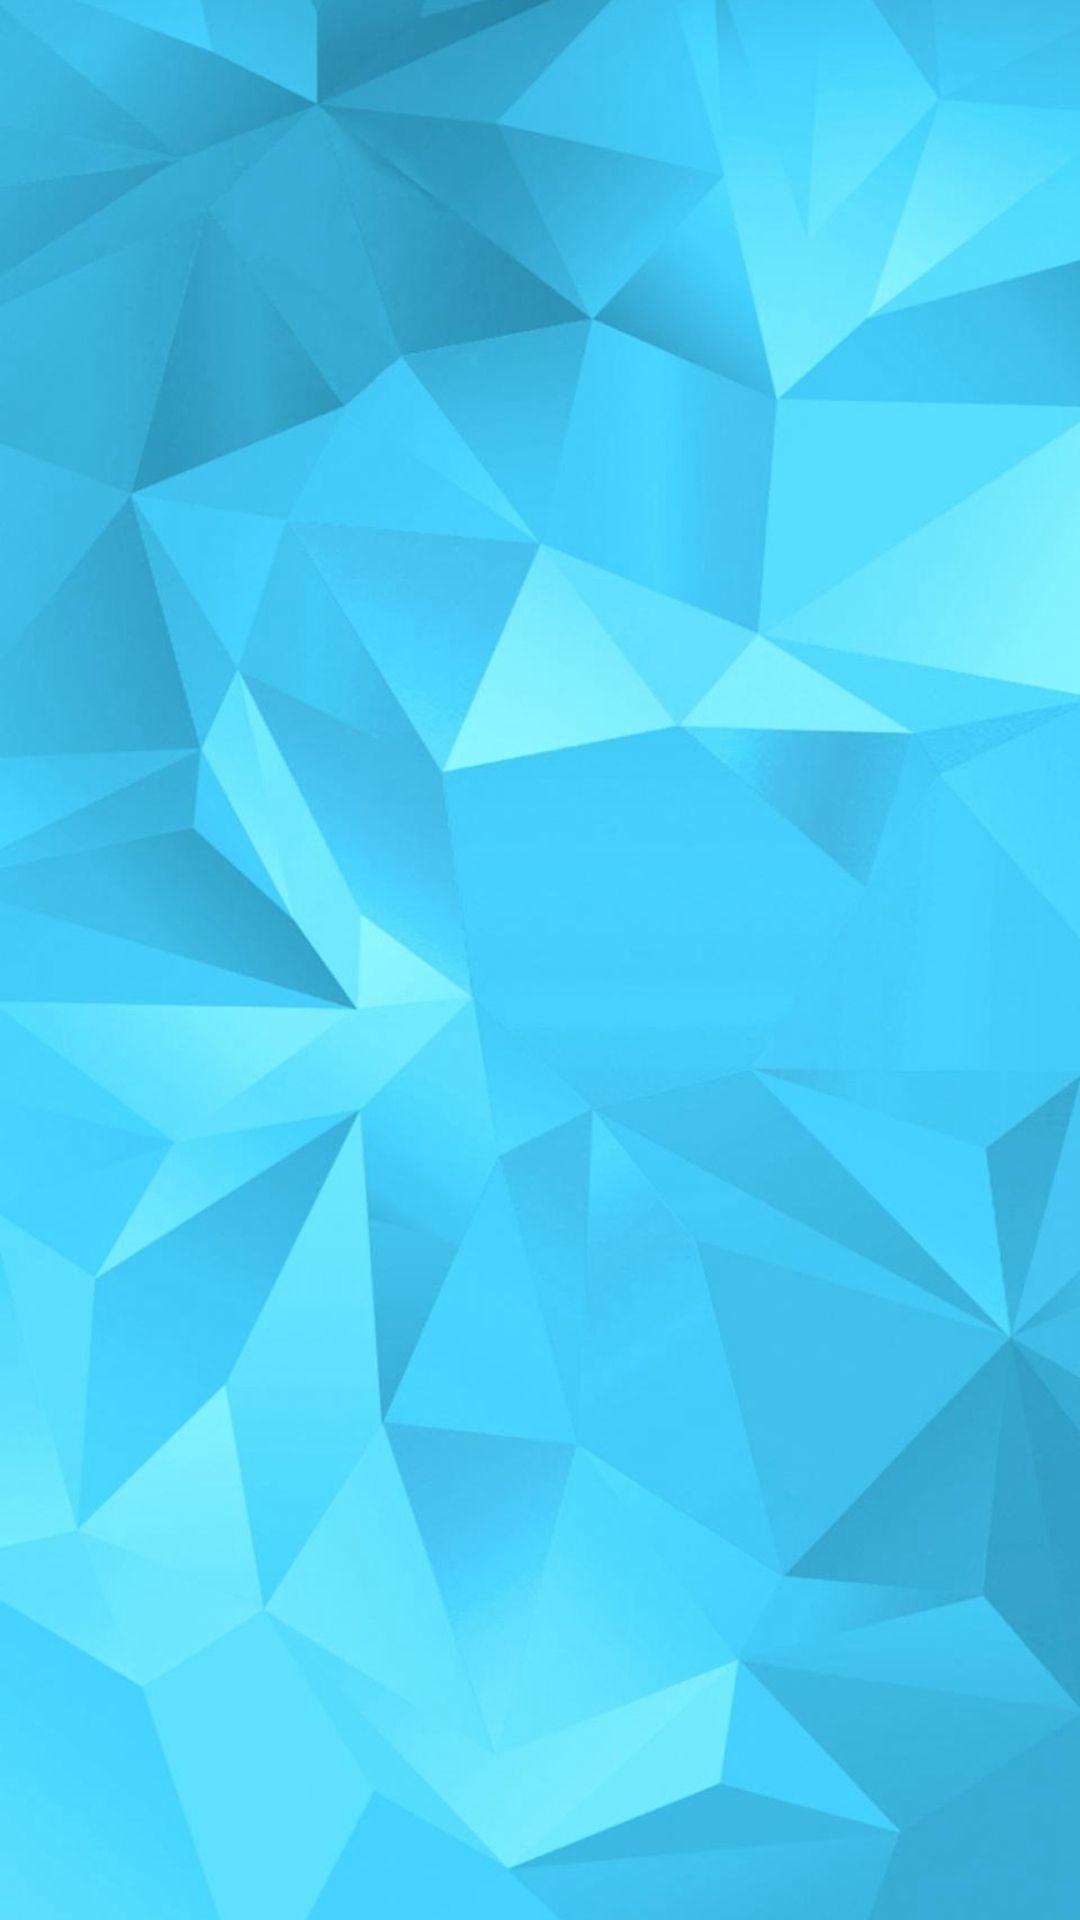 Simple Blue Fold Polygon Pattern Wallpaper Iphone 6 Wallpaper Download Iphone Wallpapers Ipad Wal Iphone Wallpaper Pattern Polygon Pattern Pattern Wallpaper